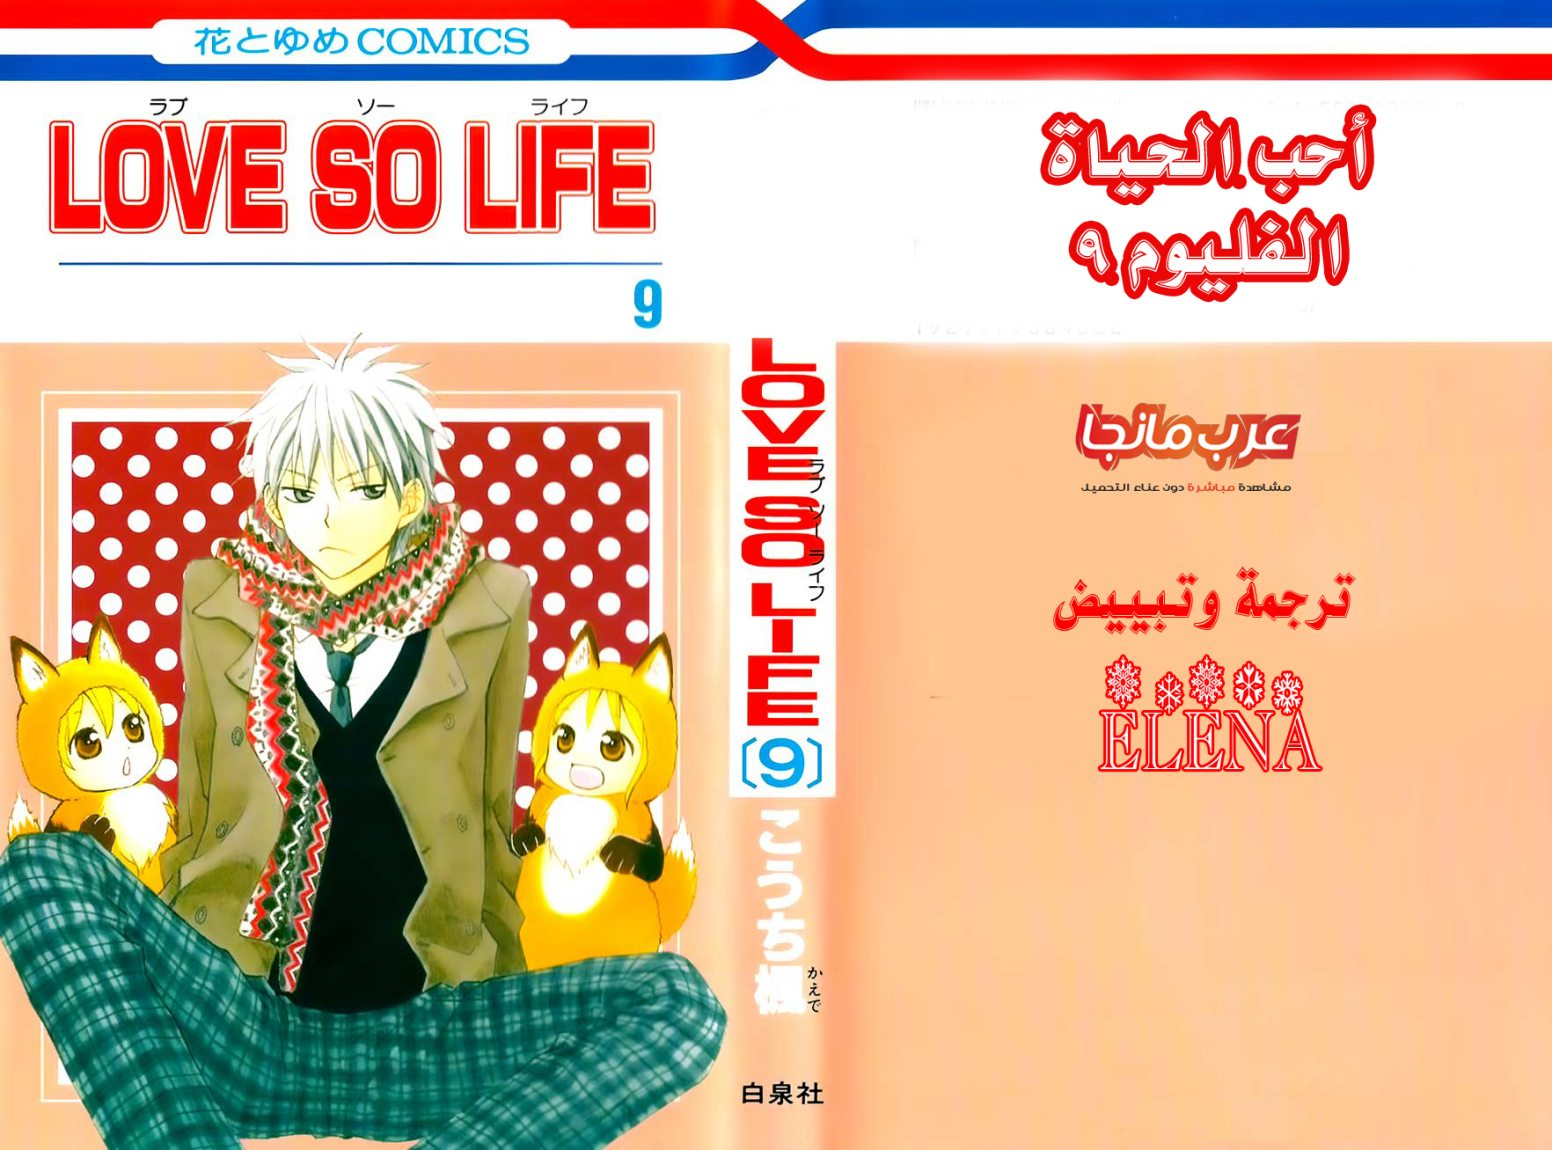 miley_cyrus_manga_manga_mexat_Love_So_Life_00000000000000000000000000000000001